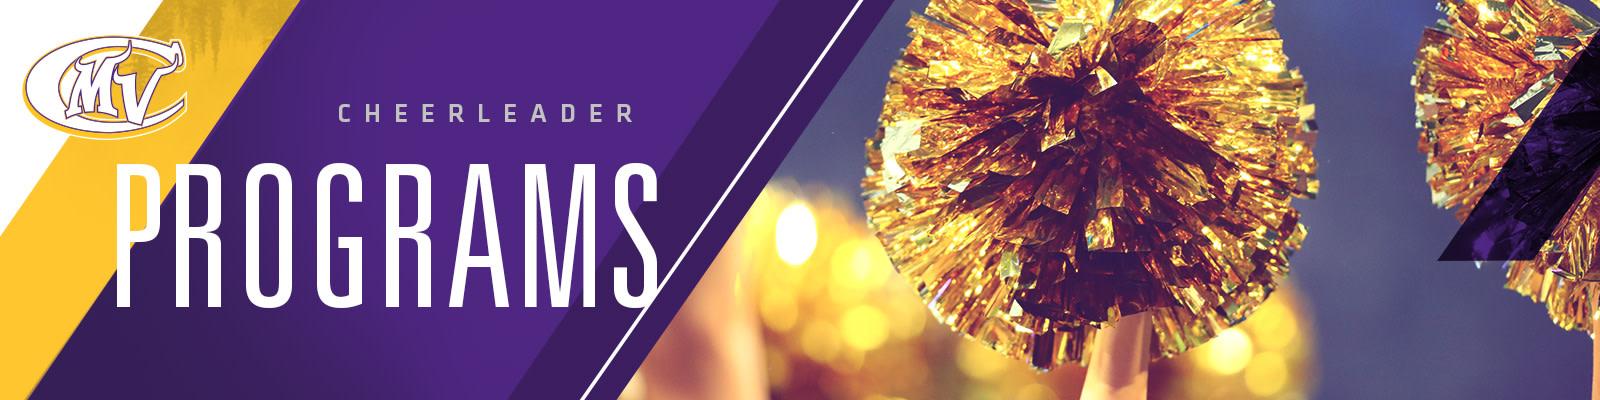 acb21b3dc Vikings Cheerleader Junior Cheer Program | Minnesota Vikings ...